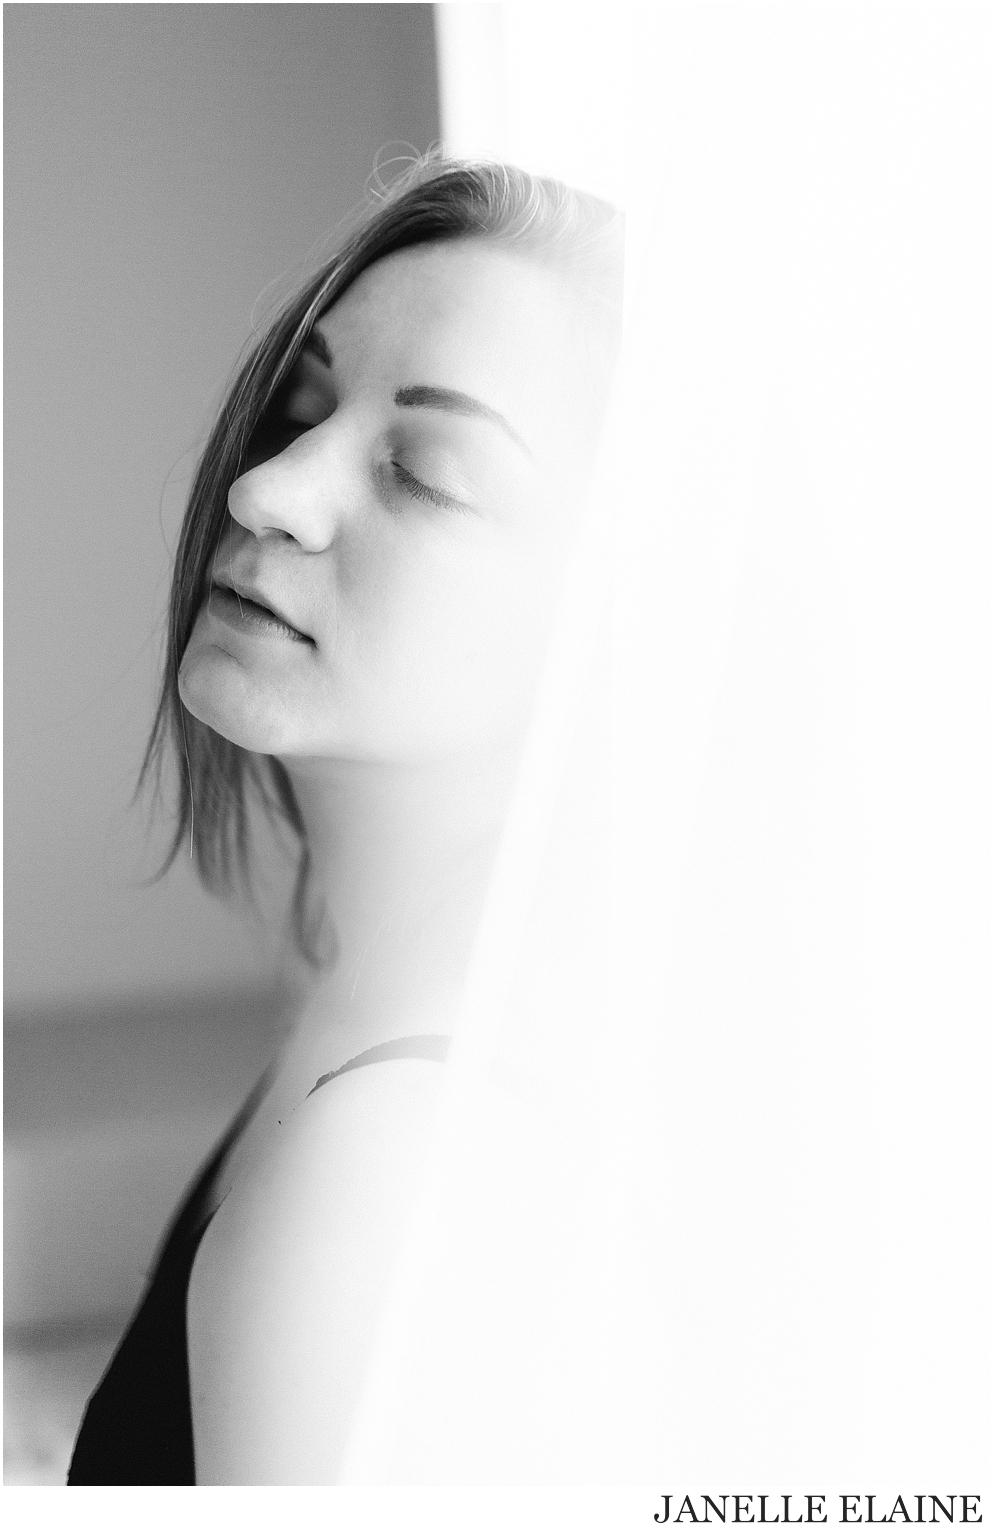 kirsi-seattle-wa-portrait photography-janelle elaine photography-79.jpg